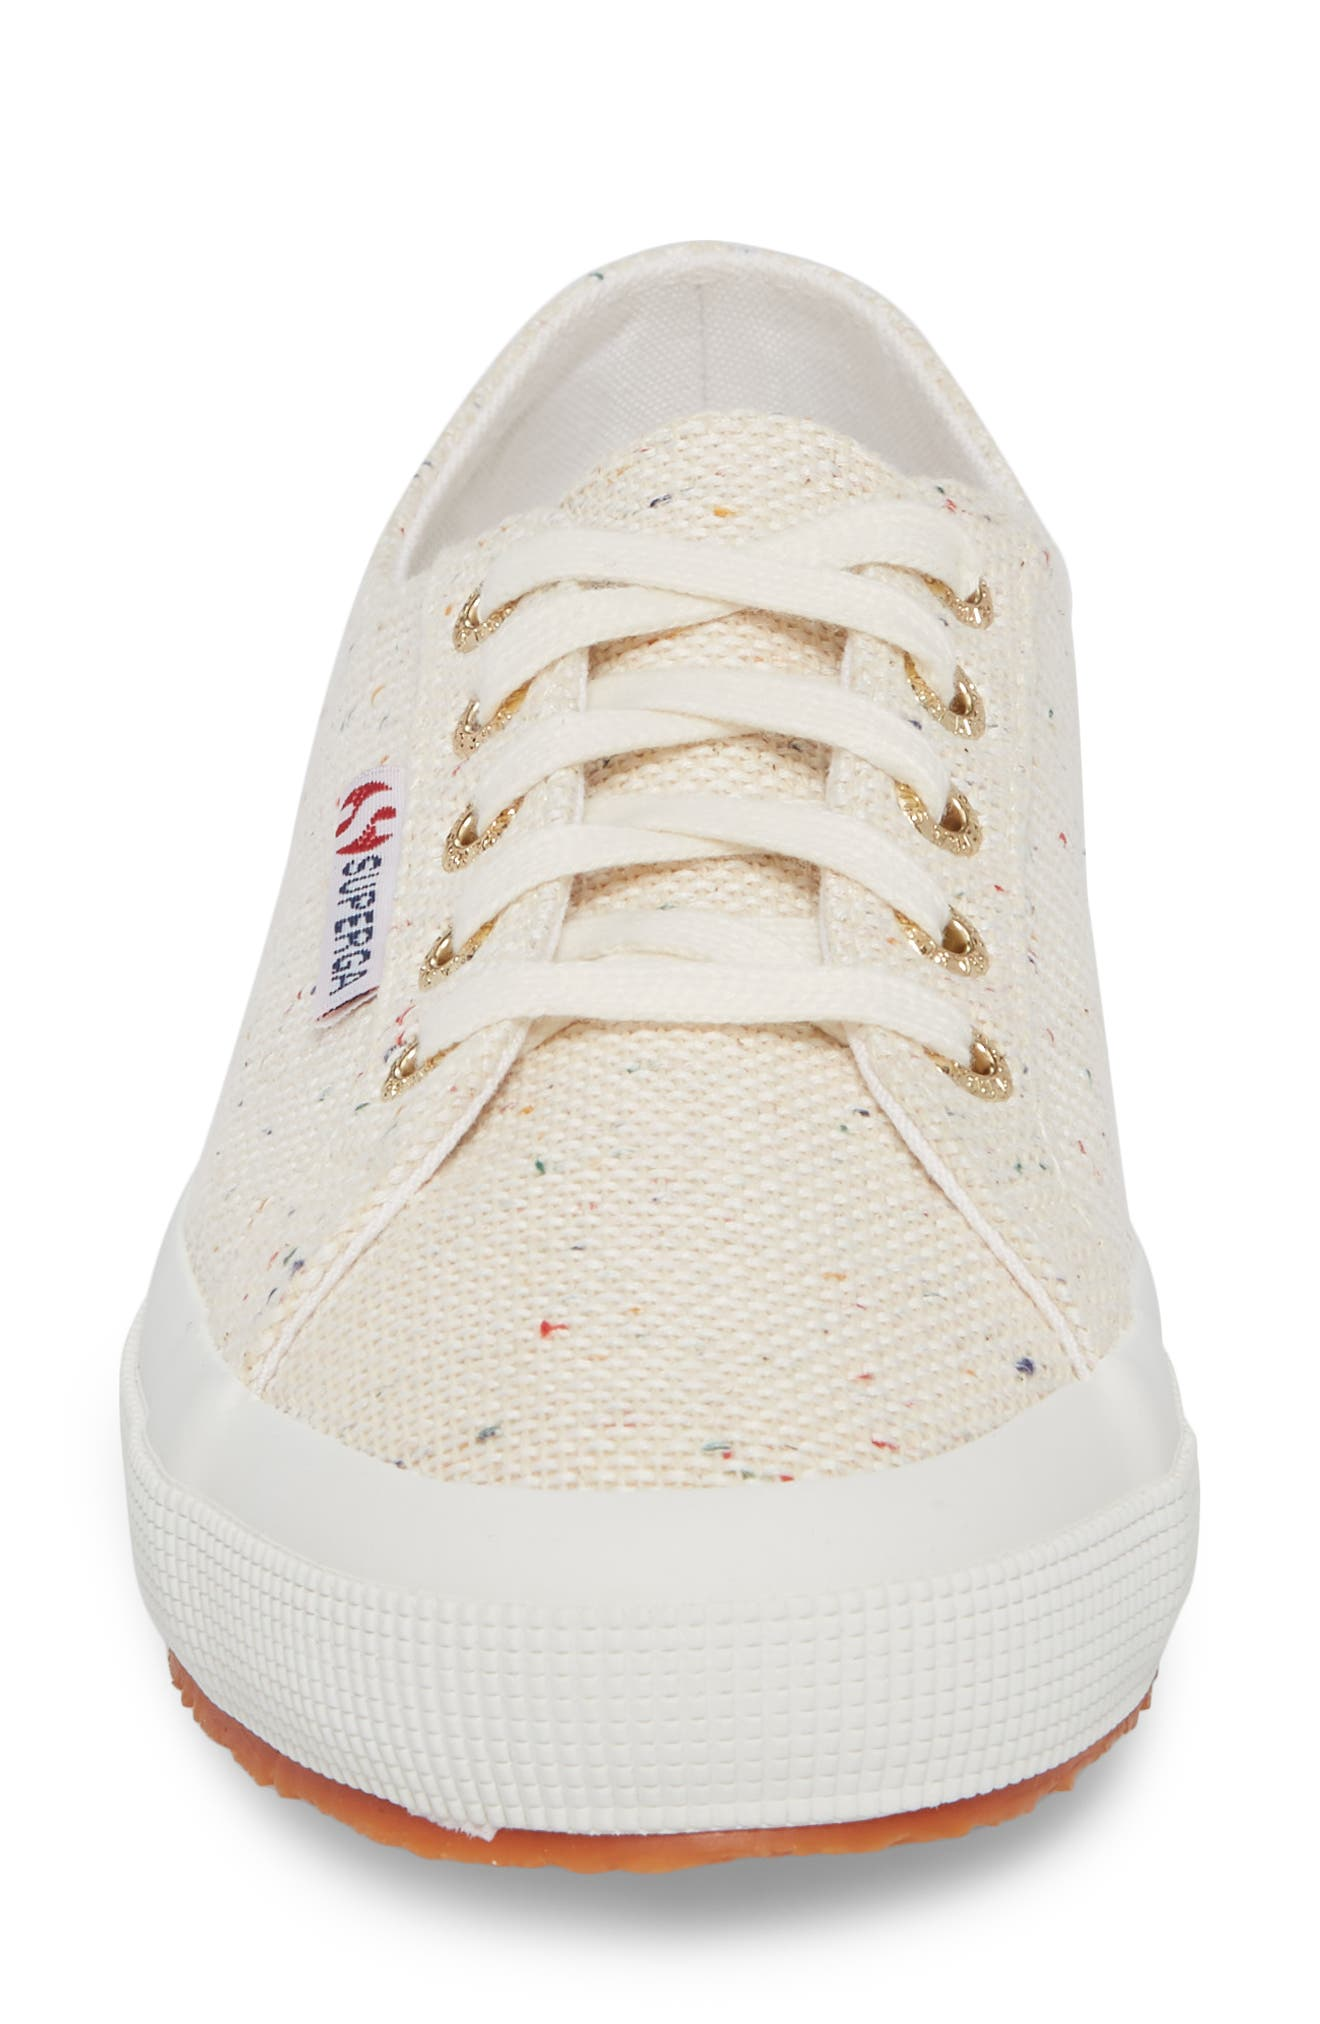 SUPERGA,                             2750 Speckle Low Top Sneaker,                             Alternate thumbnail 4, color,                             900